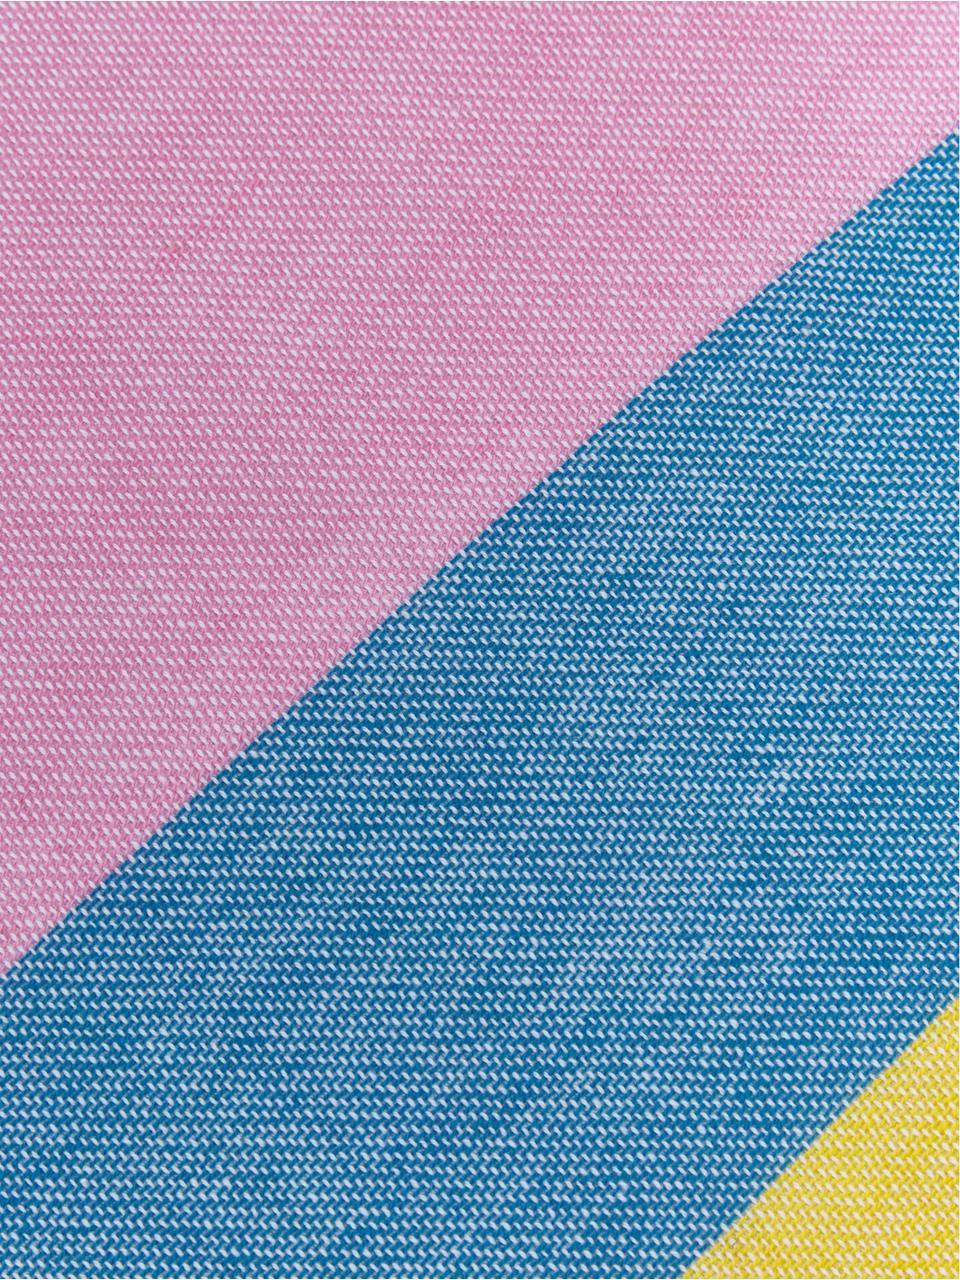 Hamamdoek Holidays, Katoen, lichte kwaliteit, 210 g/m², Geel, blauw, roze, groen, violet, 90 x 180 cm